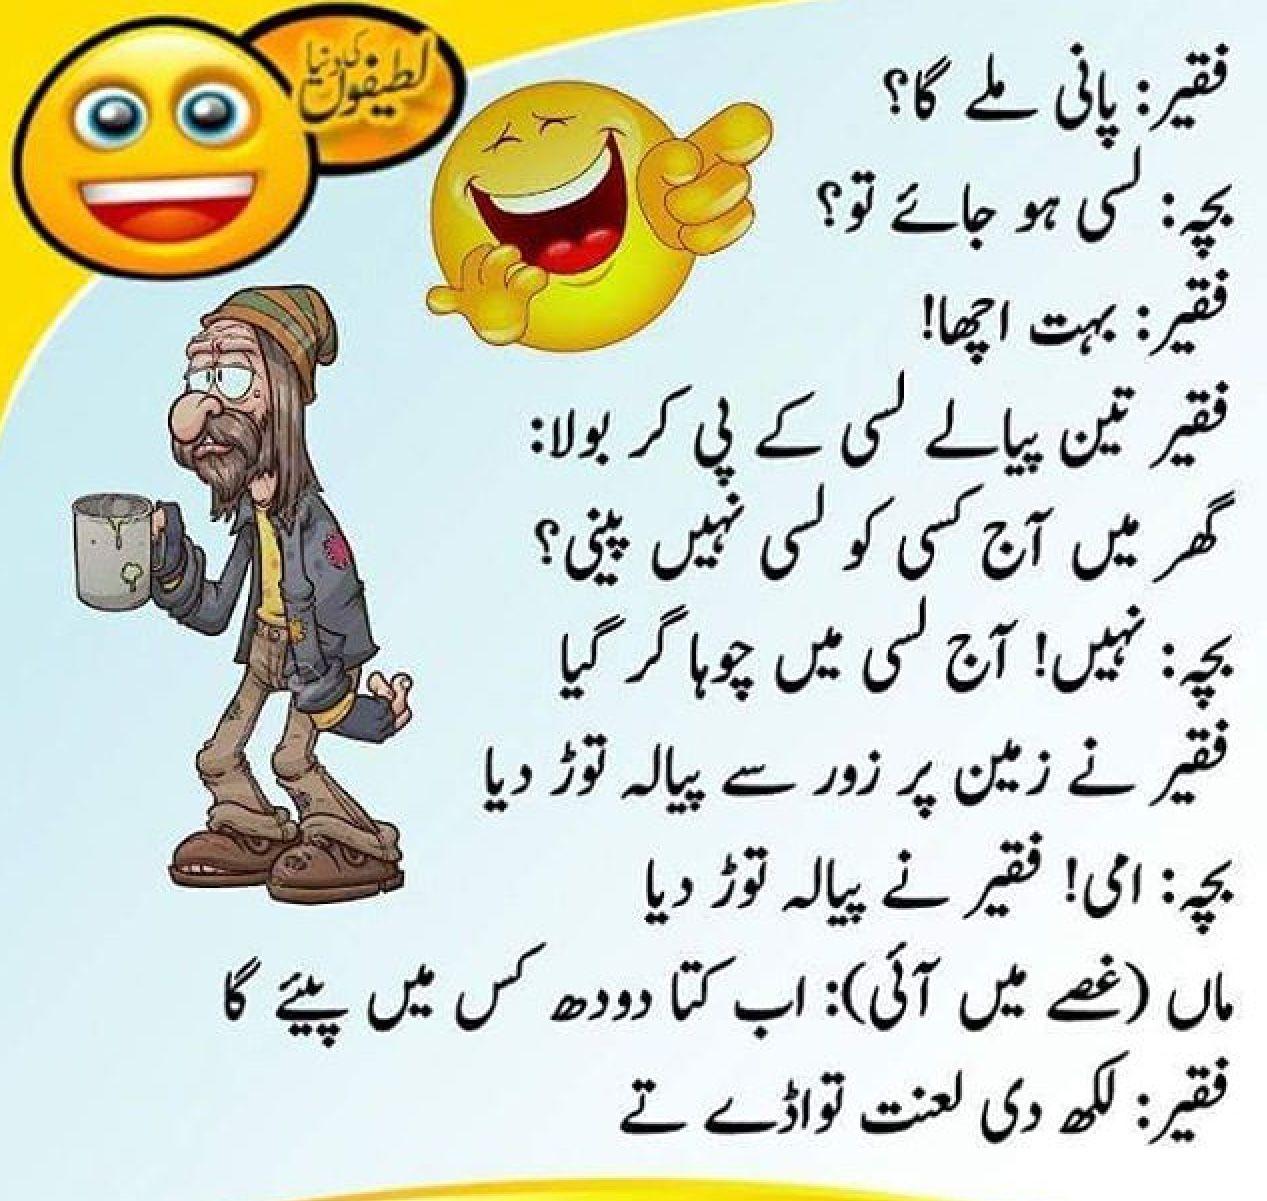 Pin by Zulfiqar Arib on Joking in 2020 Fun quotes funny